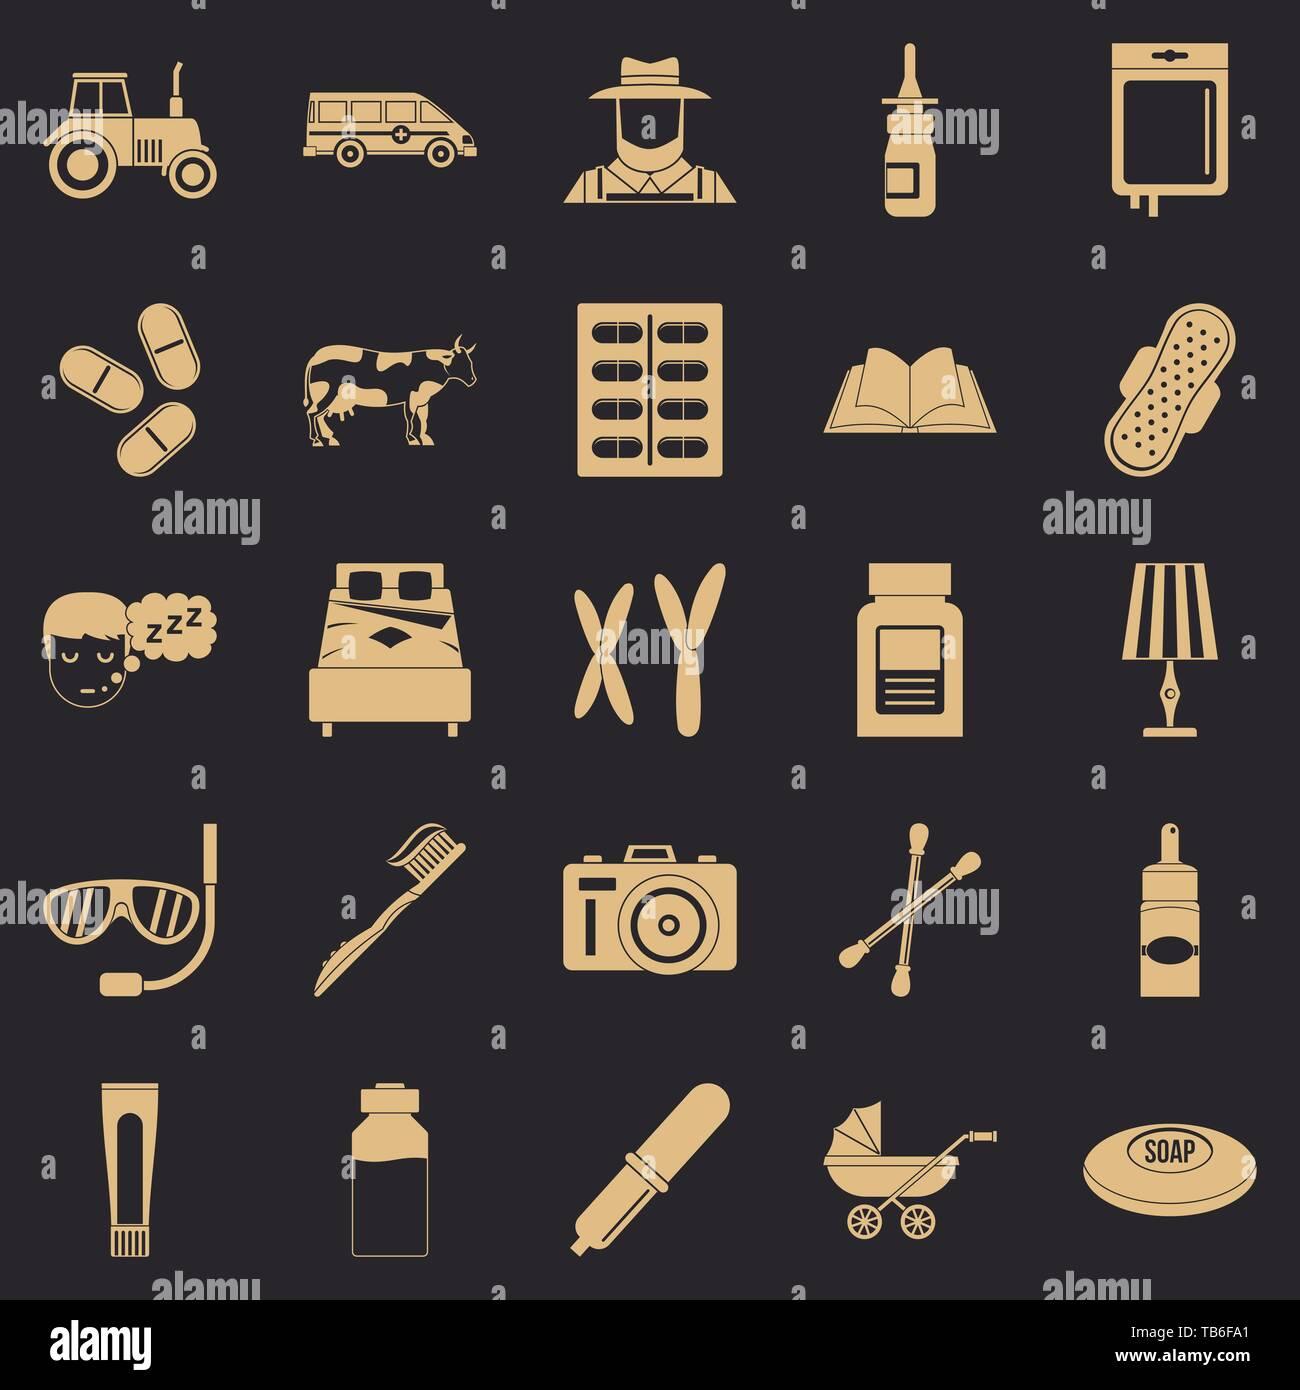 Child education icons set, simple style - Stock Image